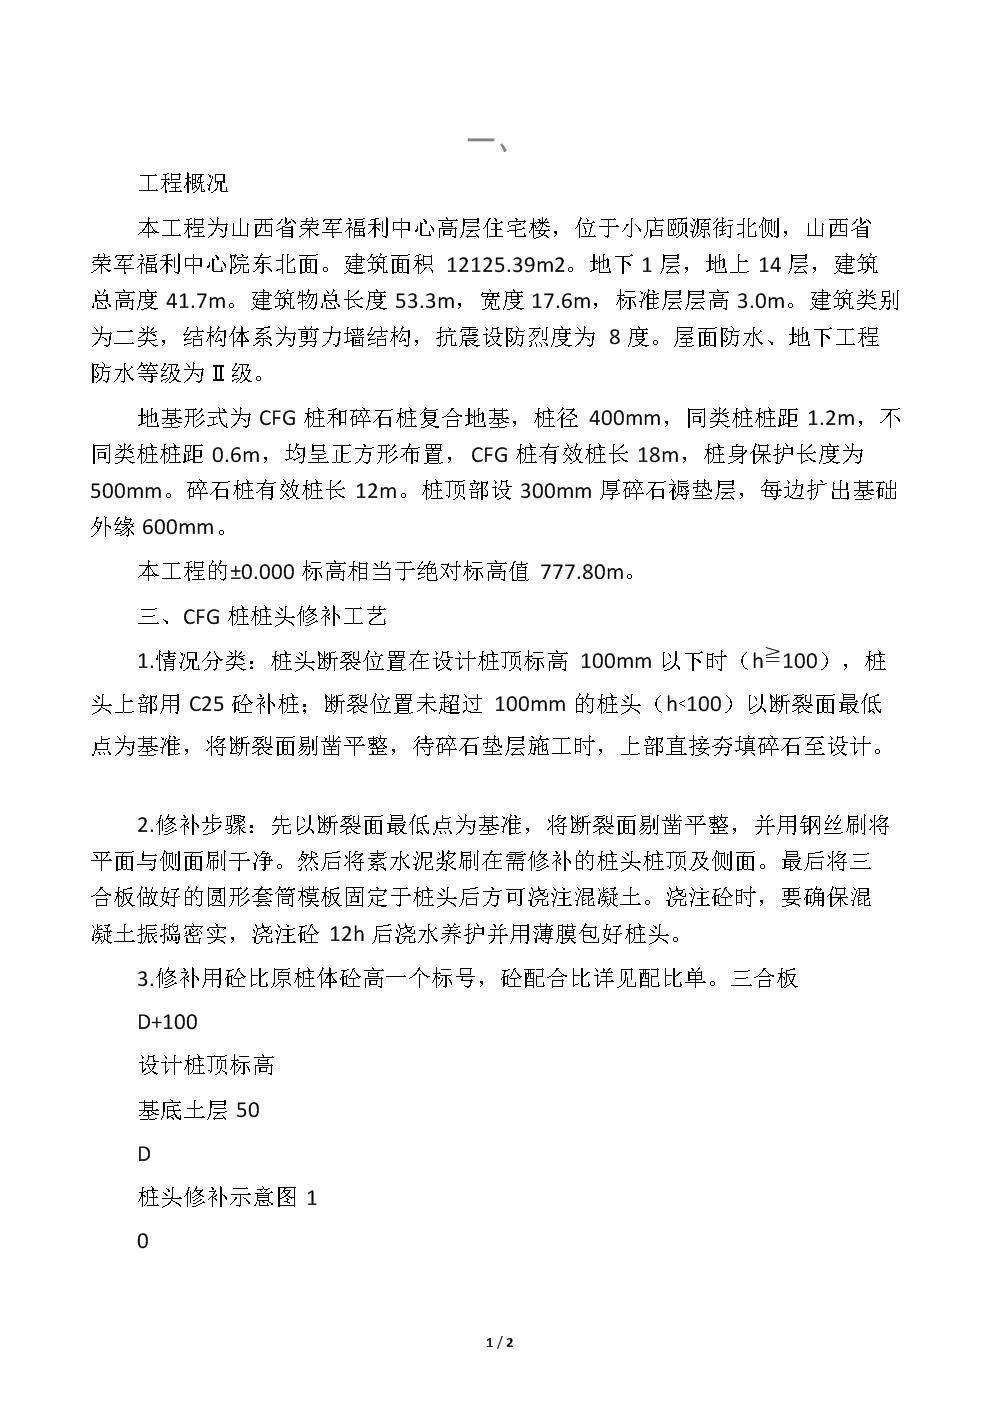 CFG桩补桩头方案.docx